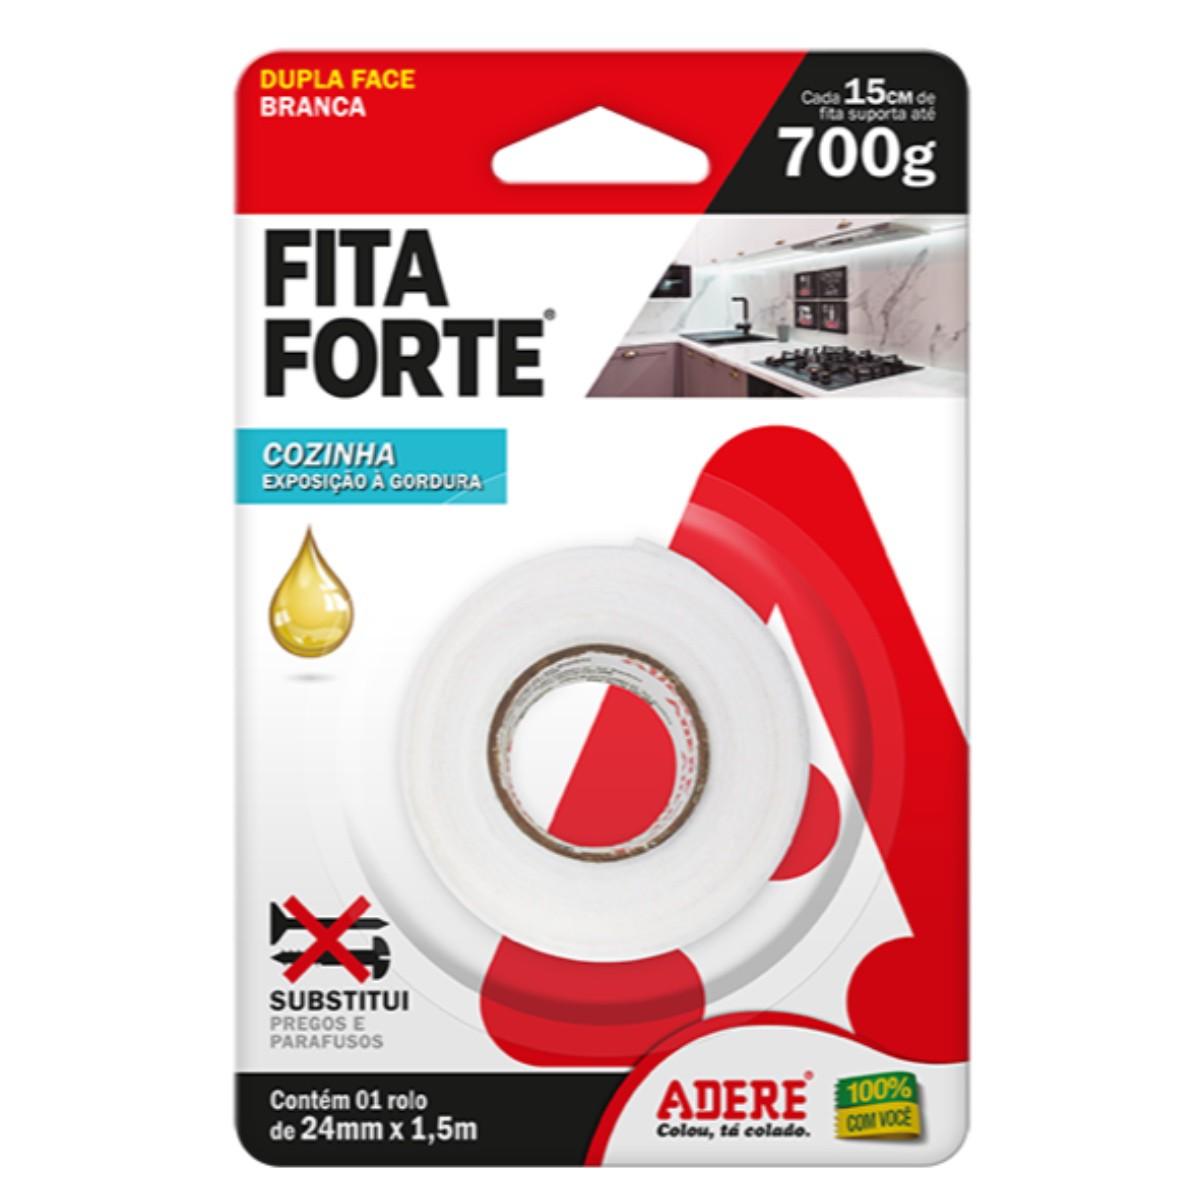 Fita Dupla Face Fita Forte 24mm X 1,5m Adere 15kg Cozinha